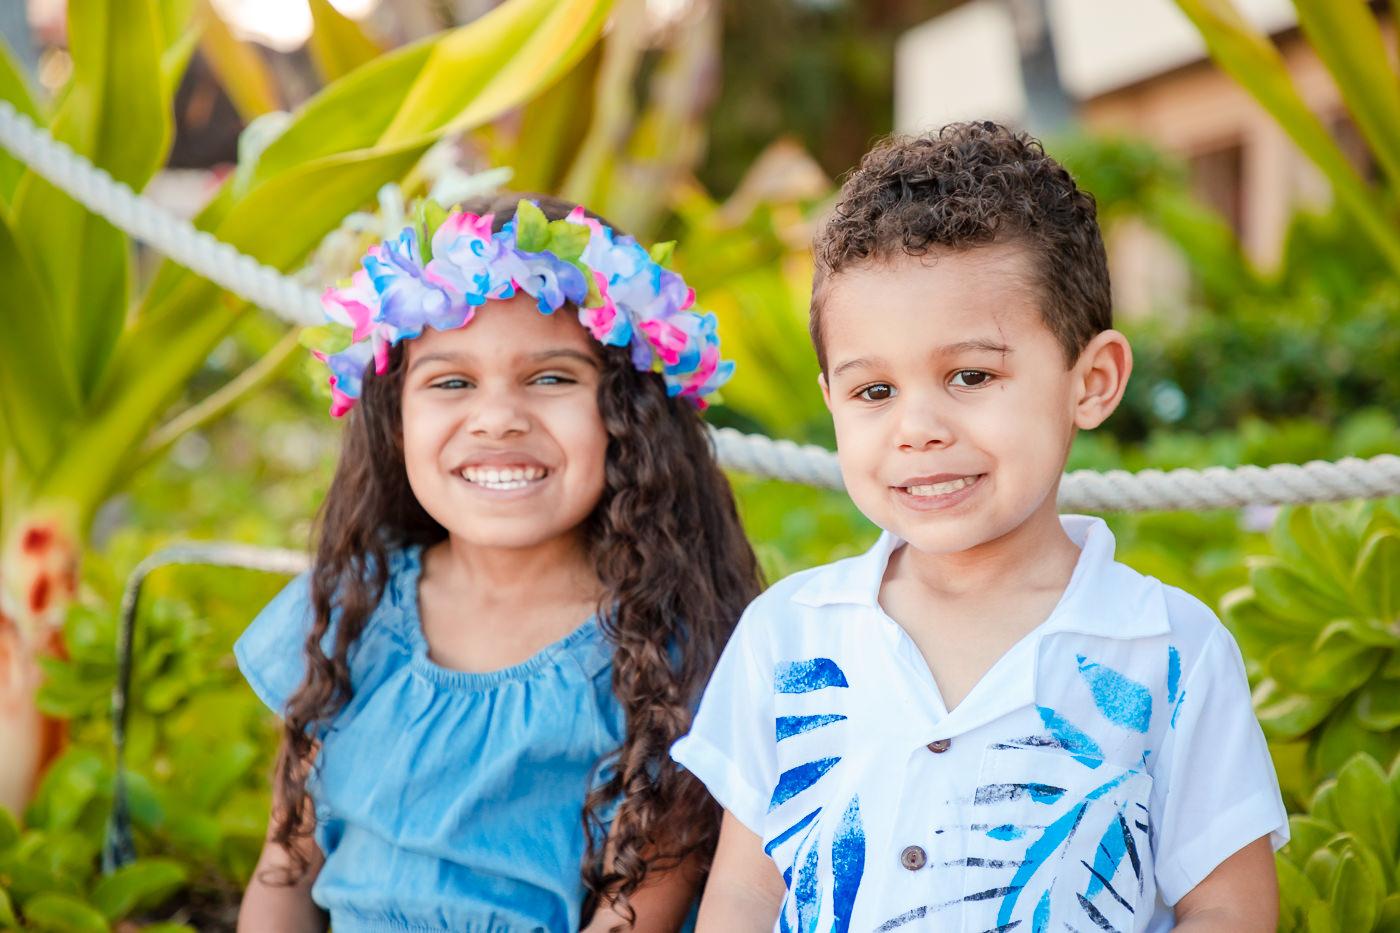 Oahu2019-3005.jpg